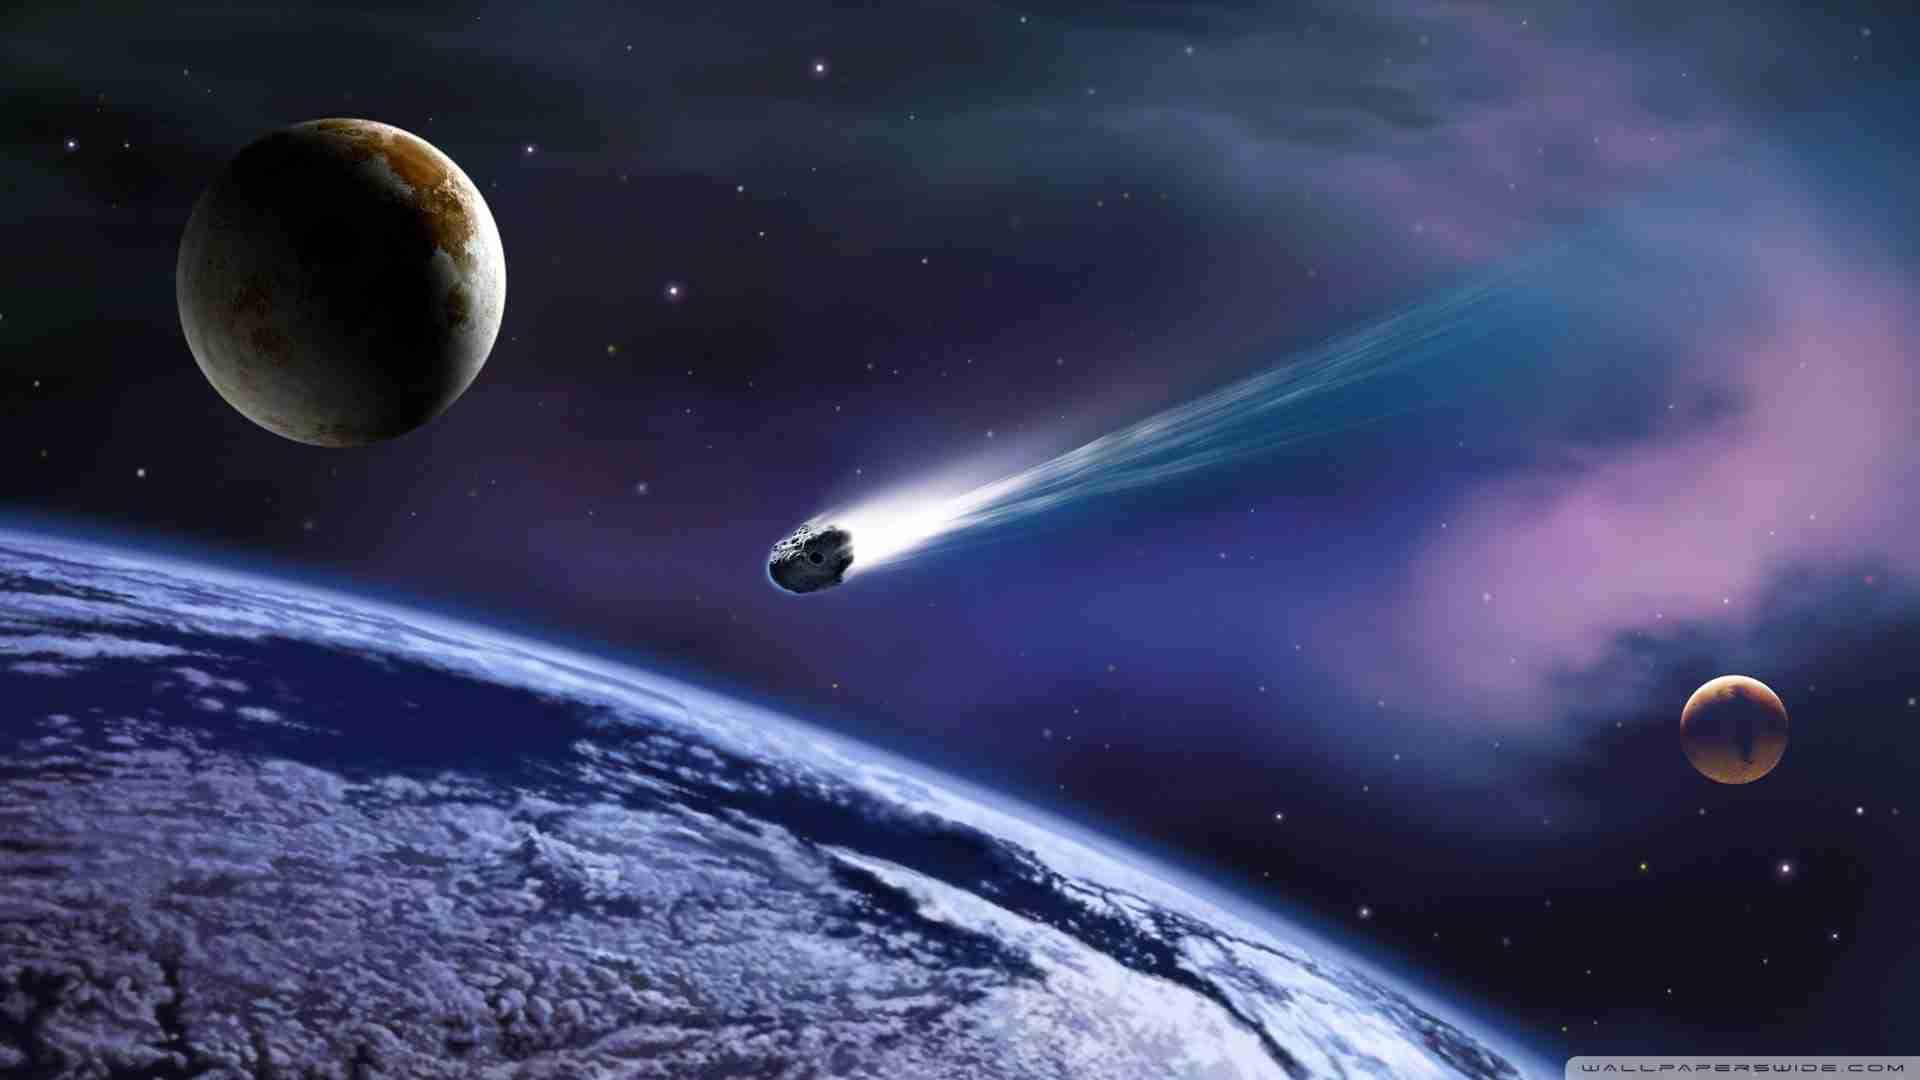 comet_00441684 - Kozan Demircan